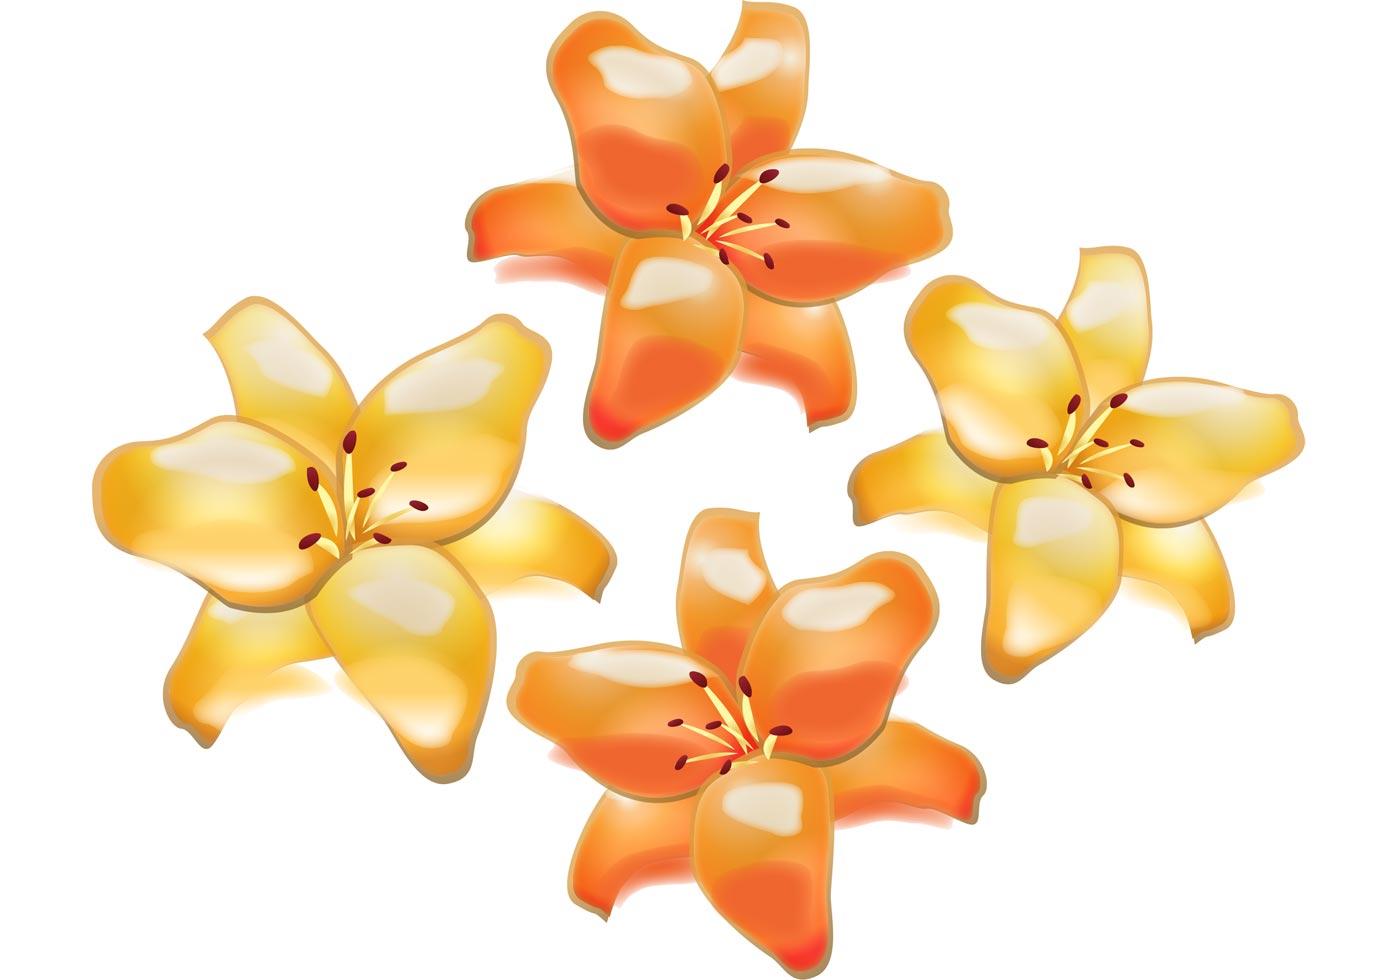 Flower Vectors - Lily Flowers